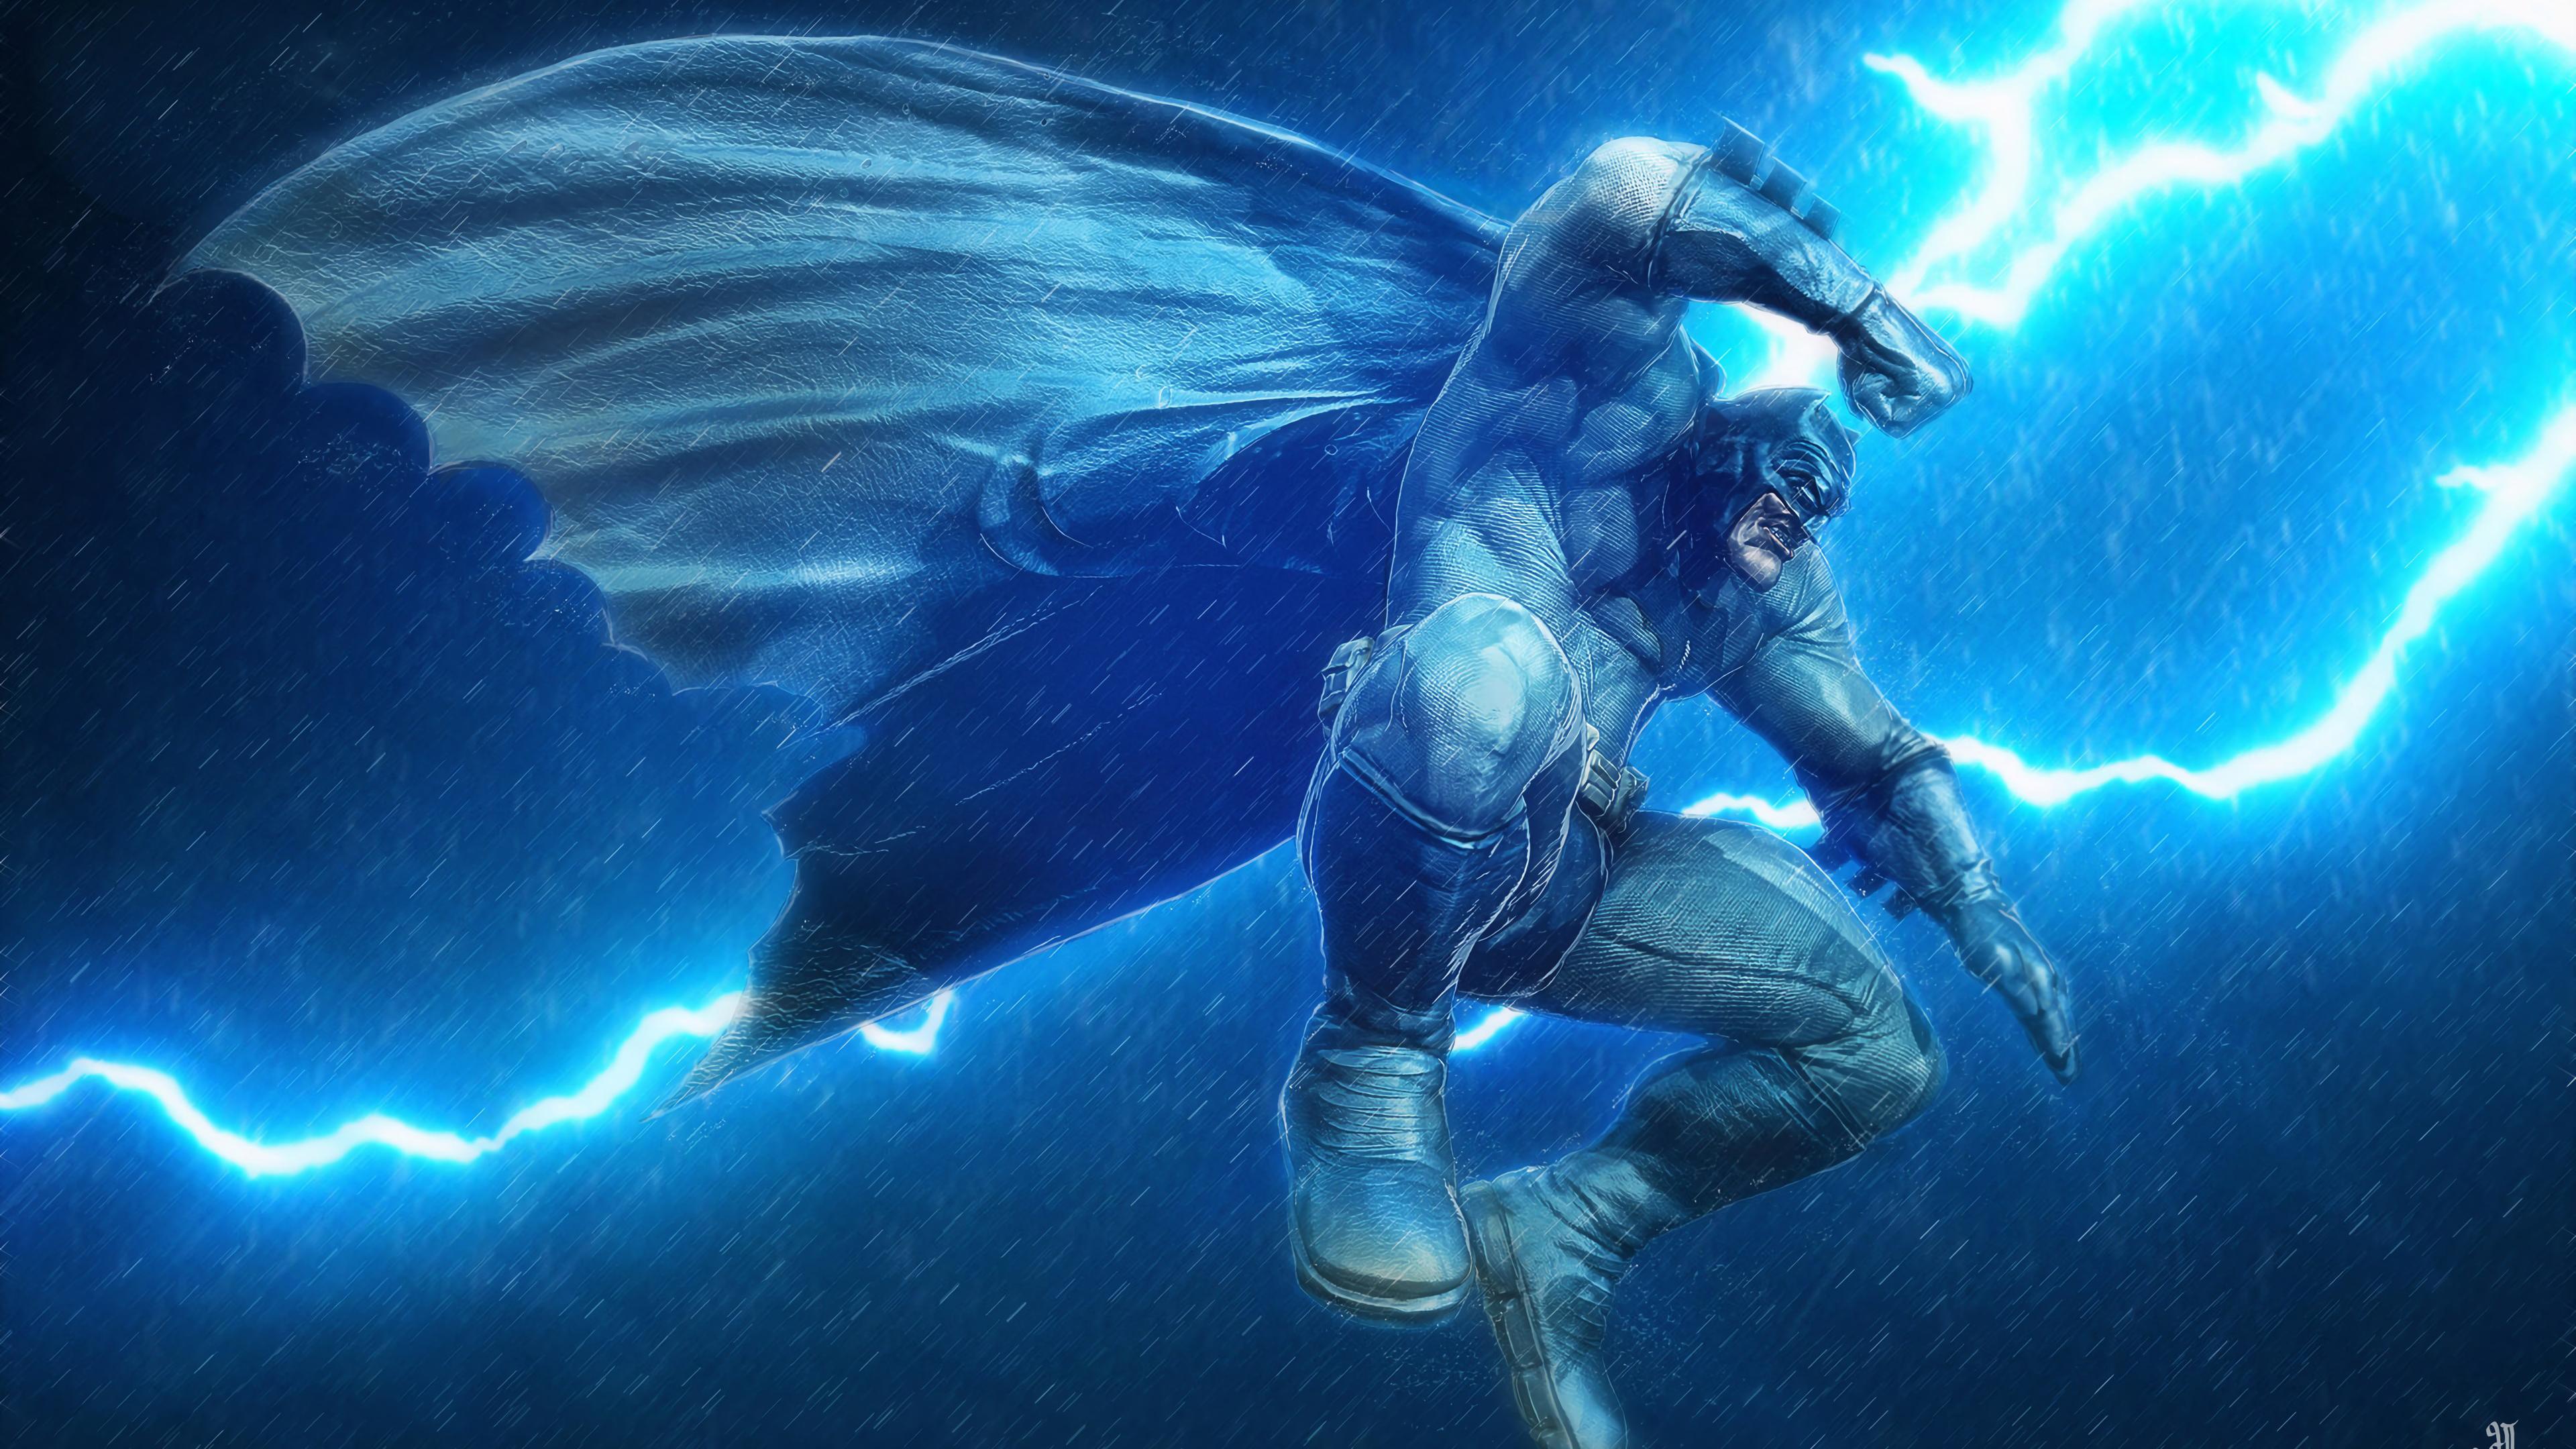 batman in thunder 1568054603 - Batman In Thunder - superheroes wallpapers, hd-wallpapers, digital art wallpapers, batman wallpapers, artwork wallpapers, artstation wallpapers, 4k-wallpapers